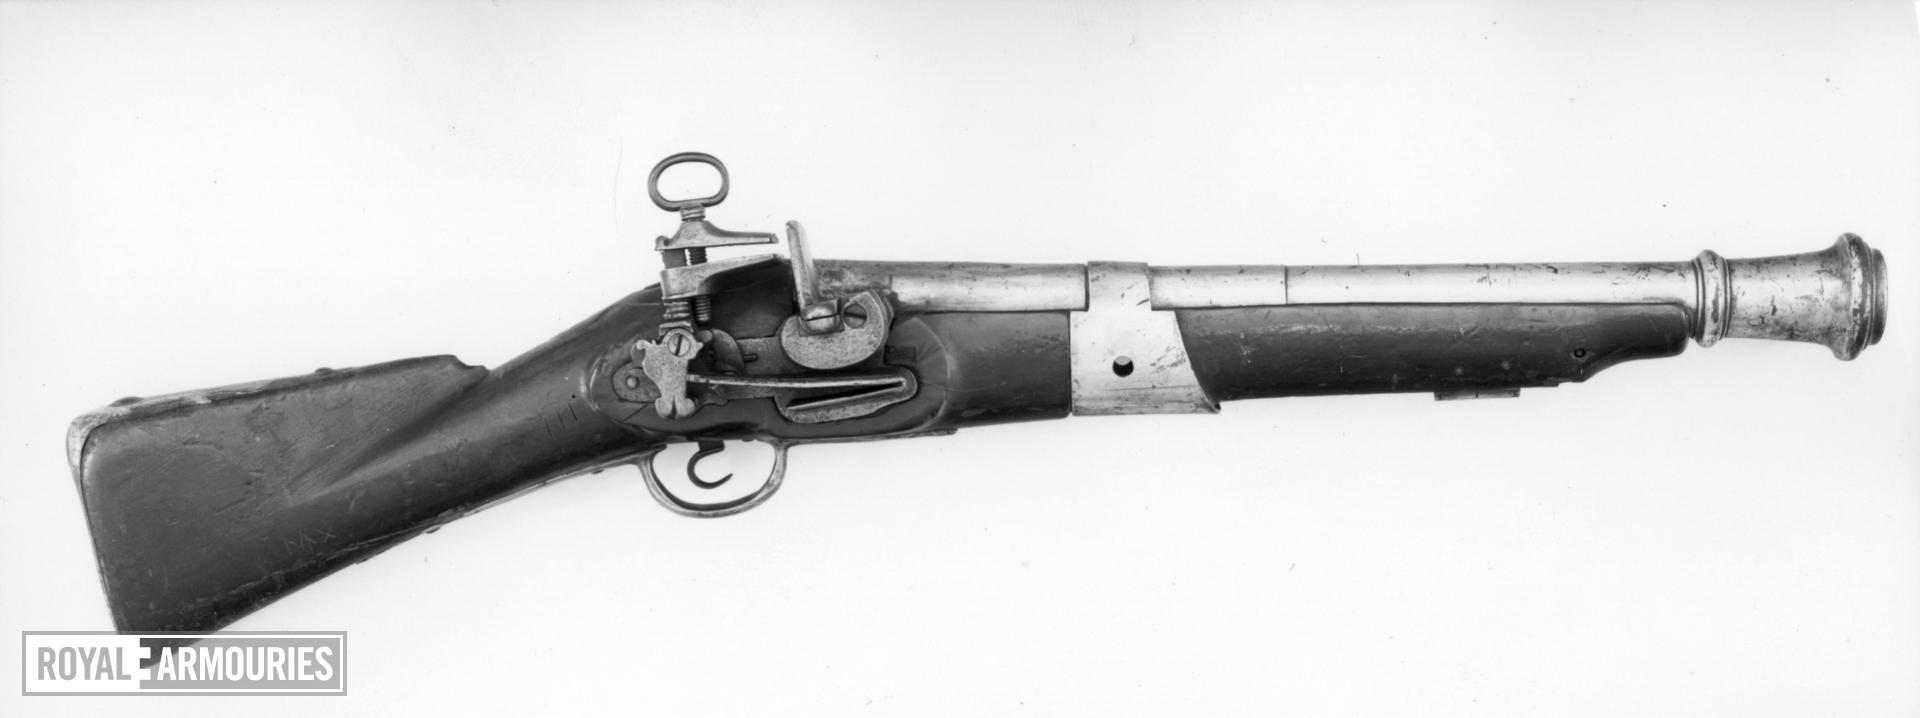 Flintlock muzzle-loading musketoon